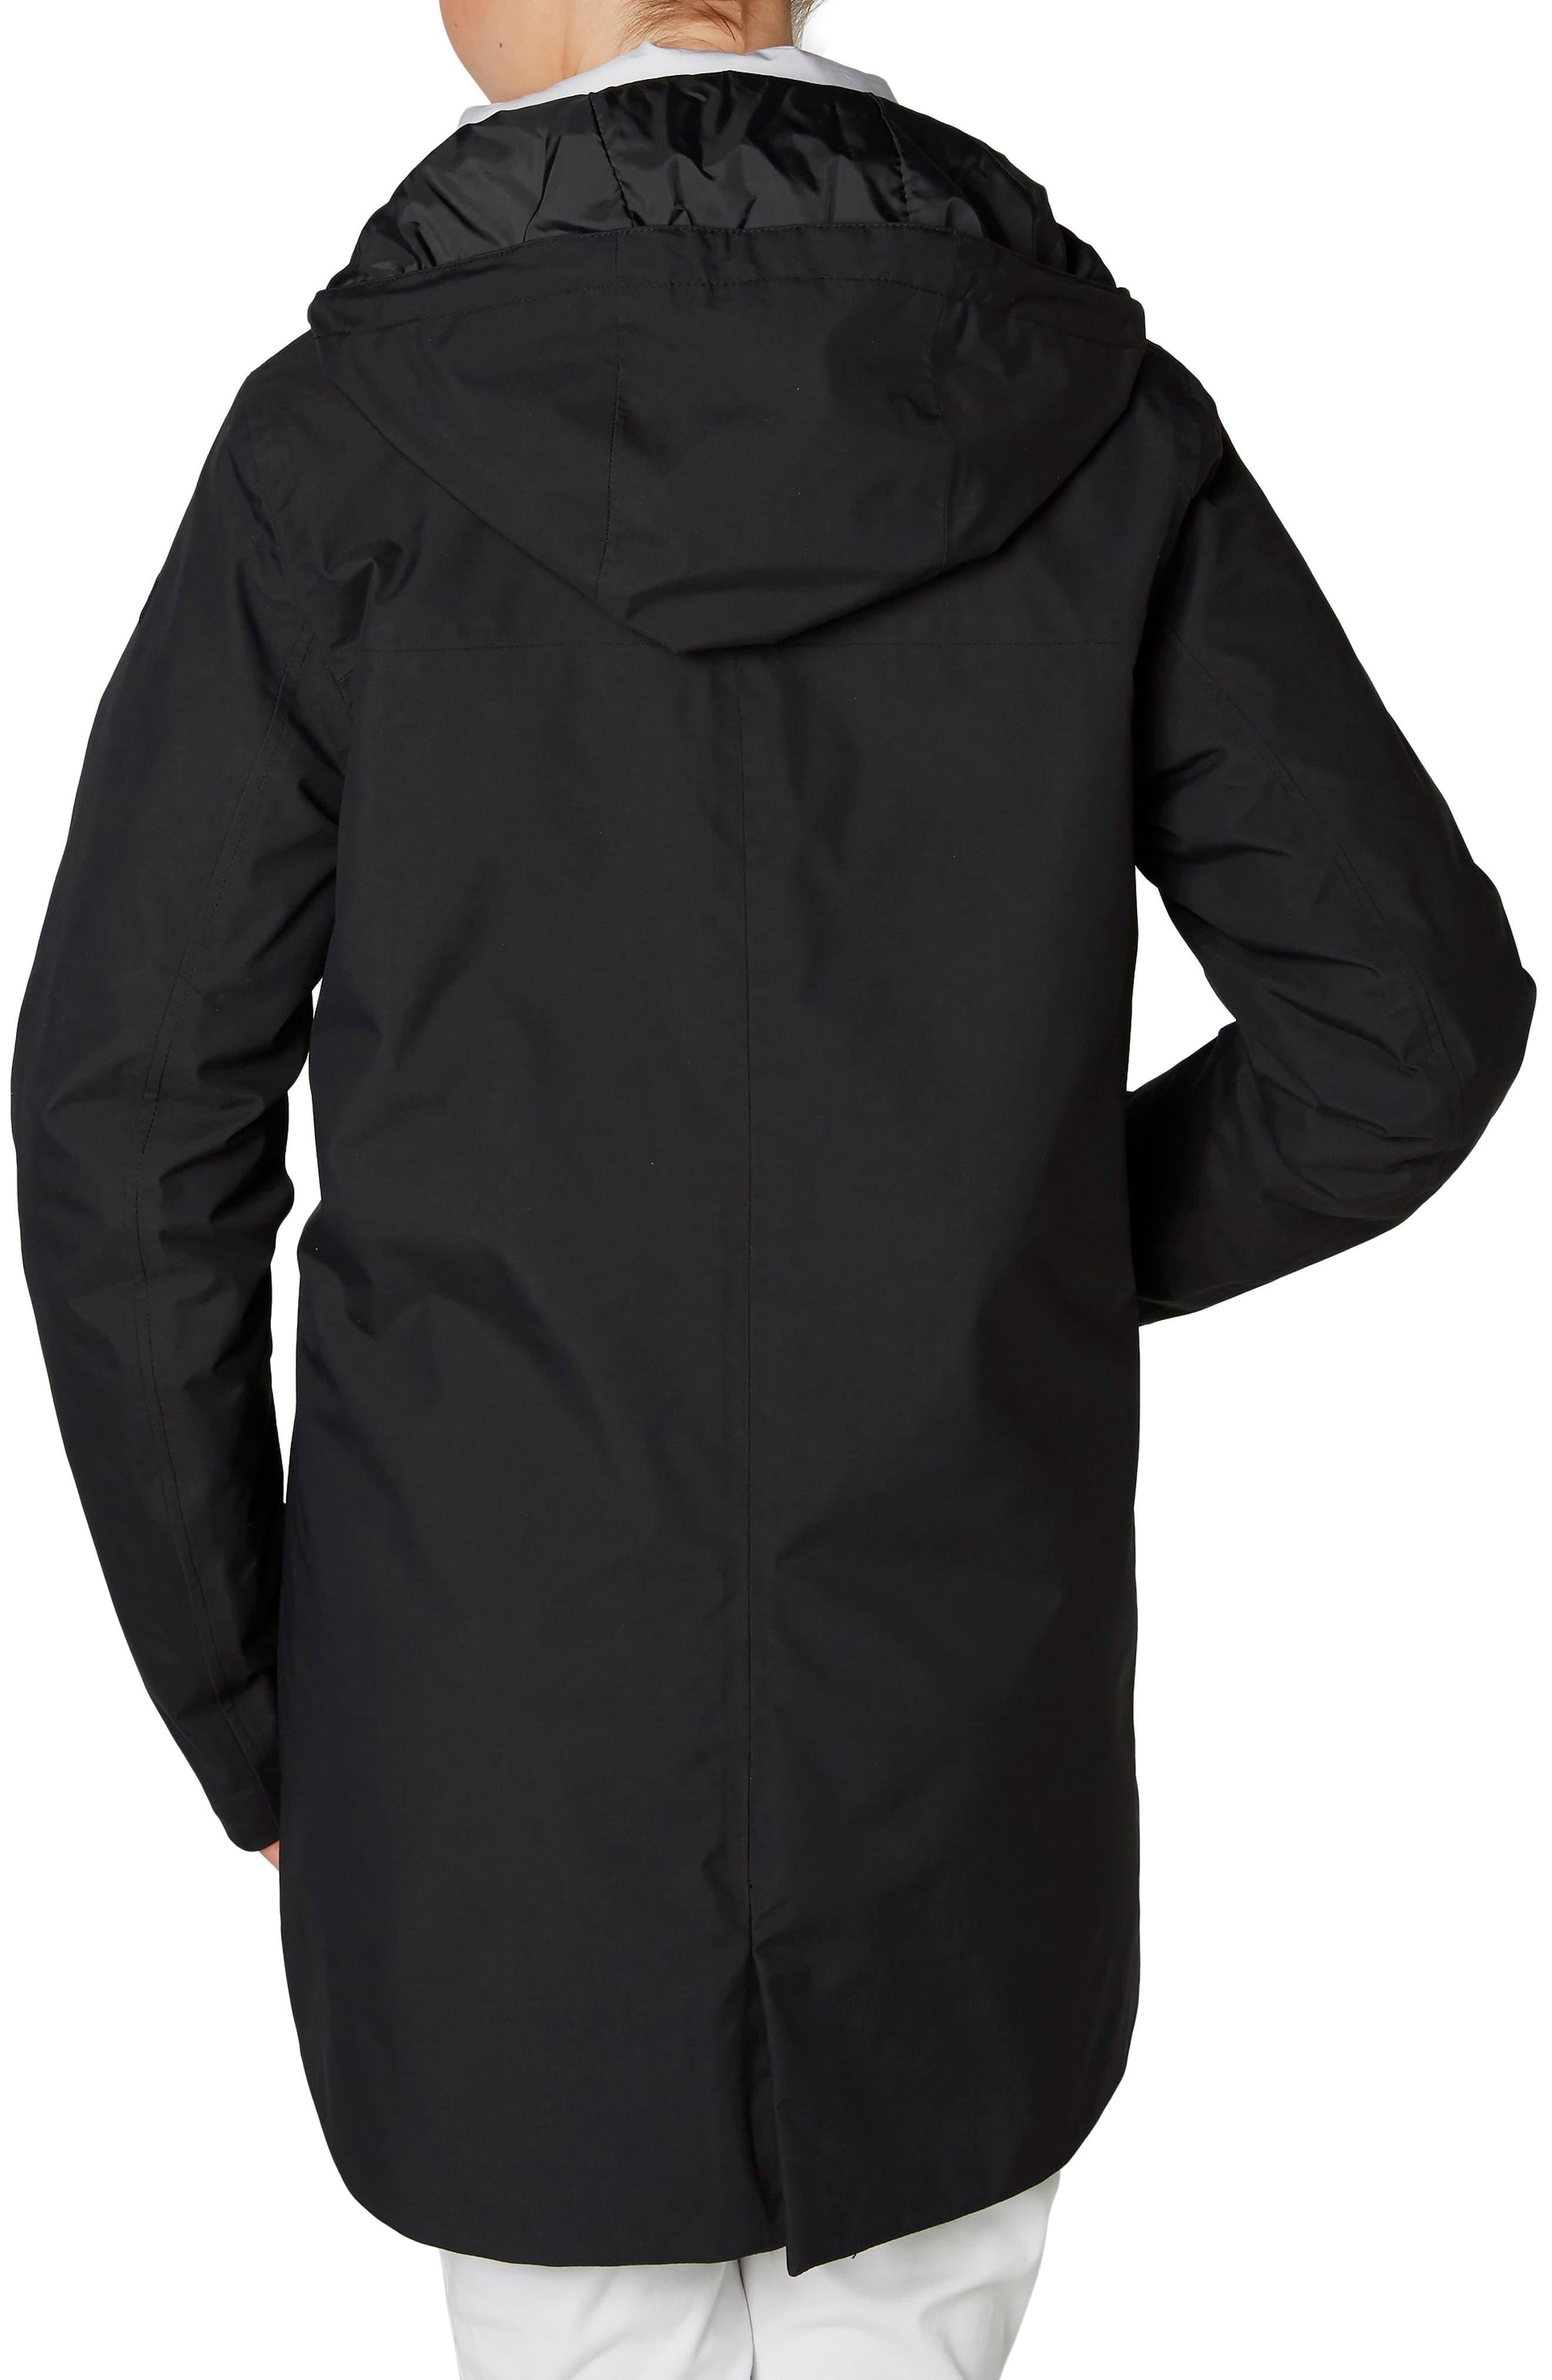 Waterford Weatherproof Hooded Parka,                             Alternate thumbnail 2, color,                             Black